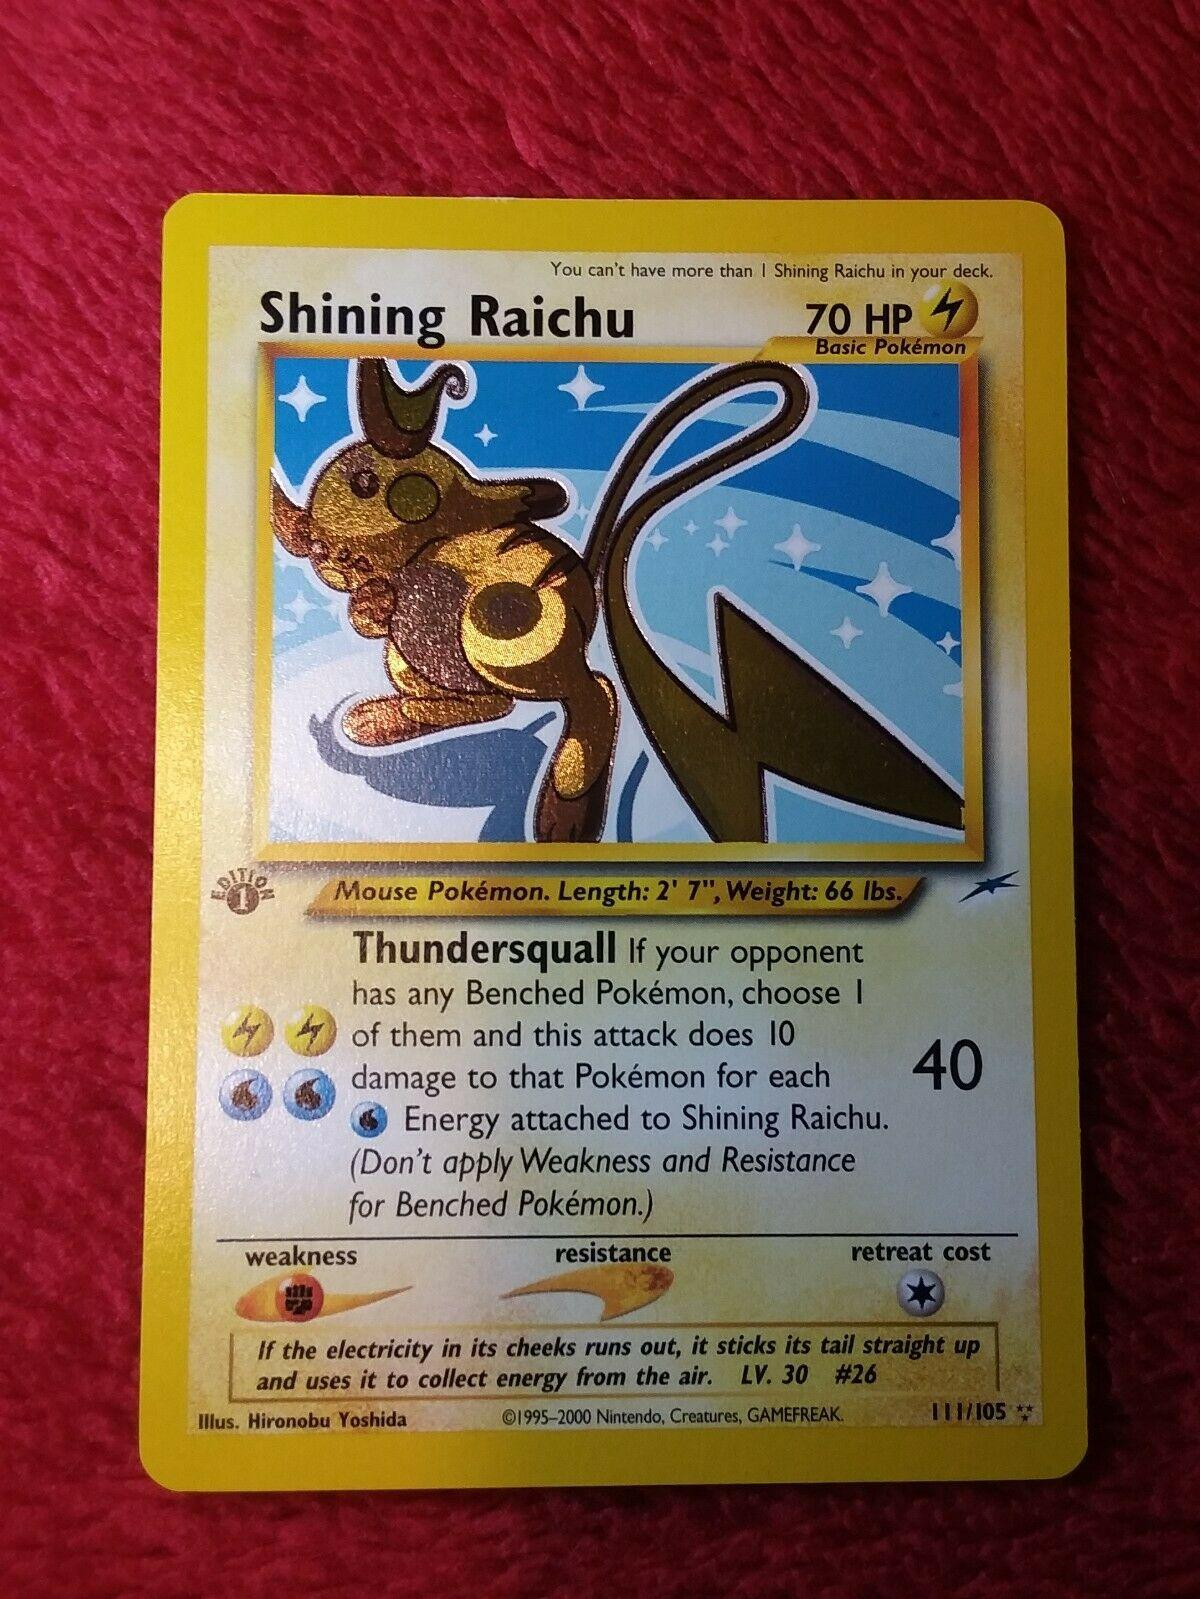 Super rare 1st edition holographic shining raichu pokemon card Great condition